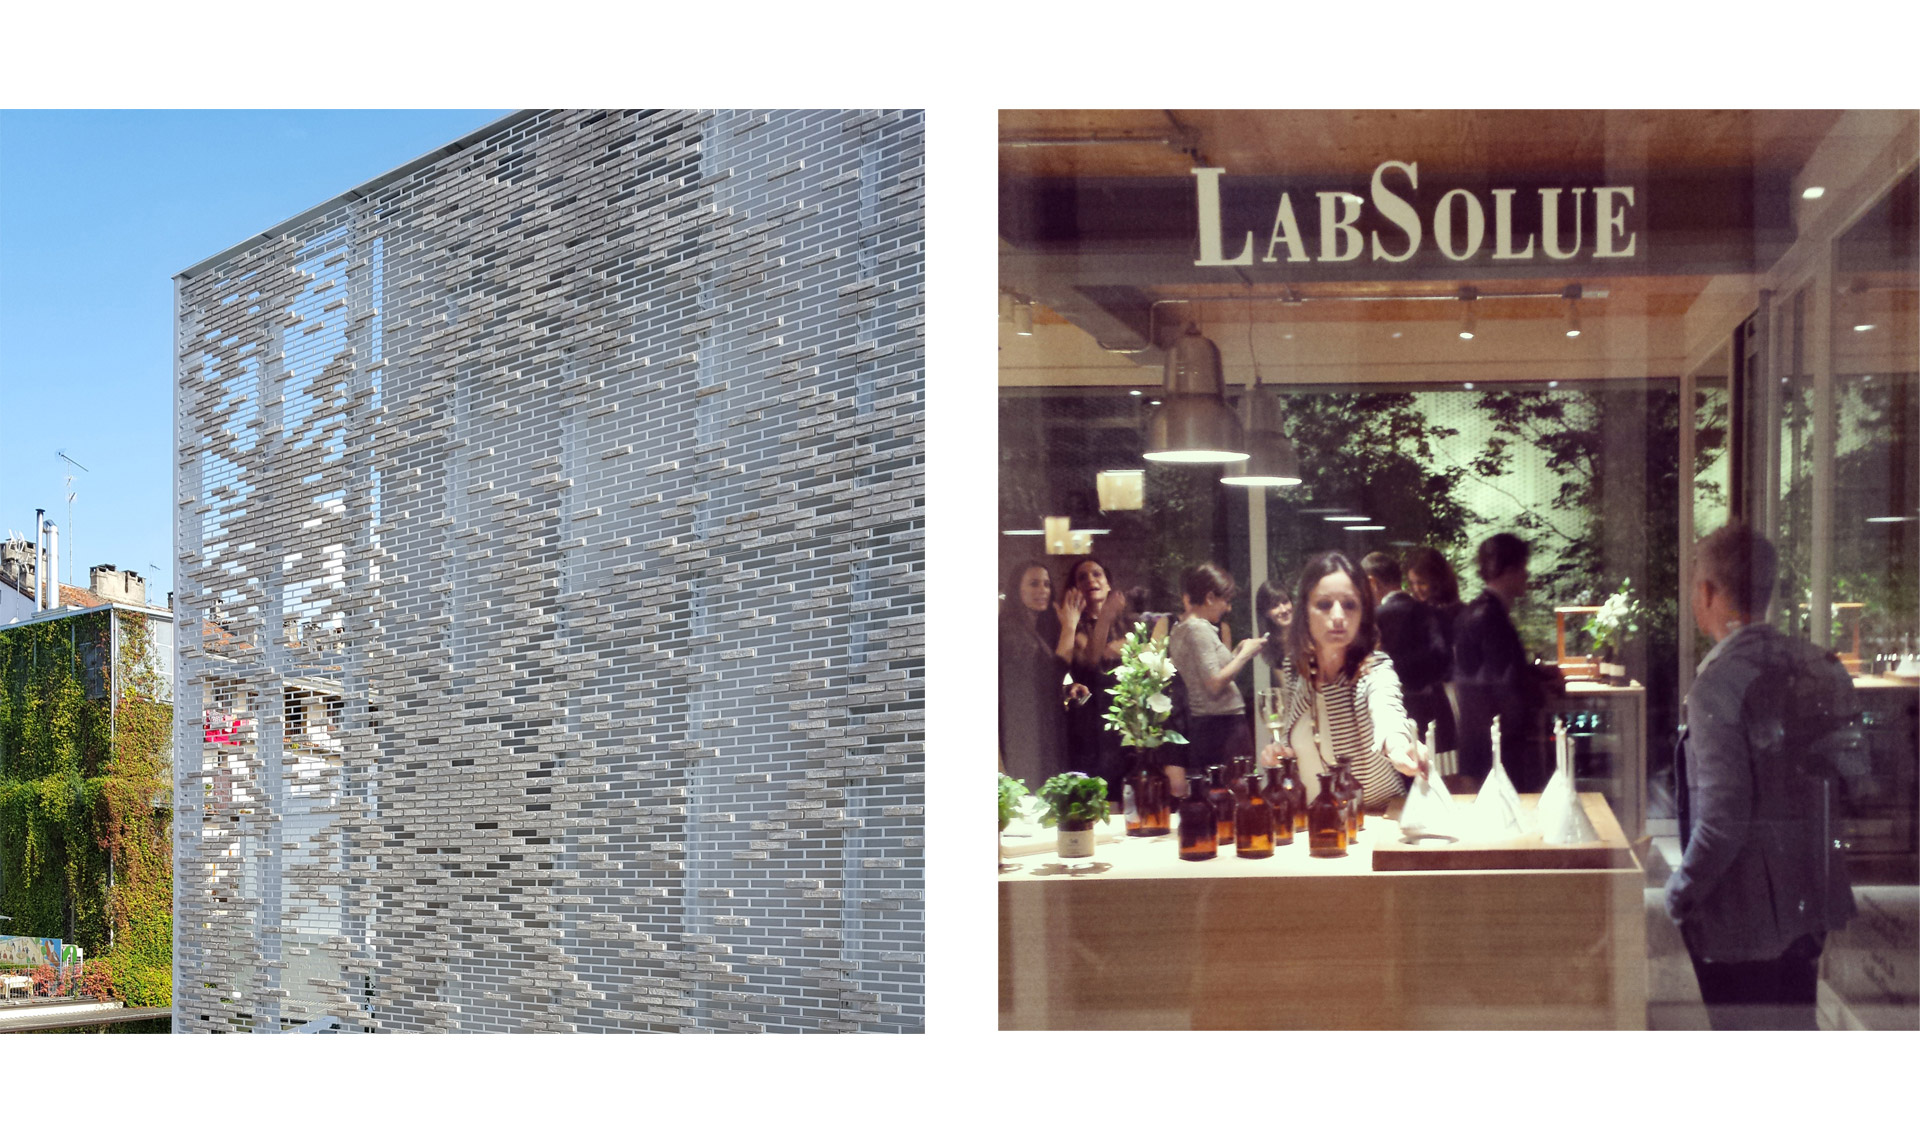 LABSOLUE, A PERFUME LABORATORY